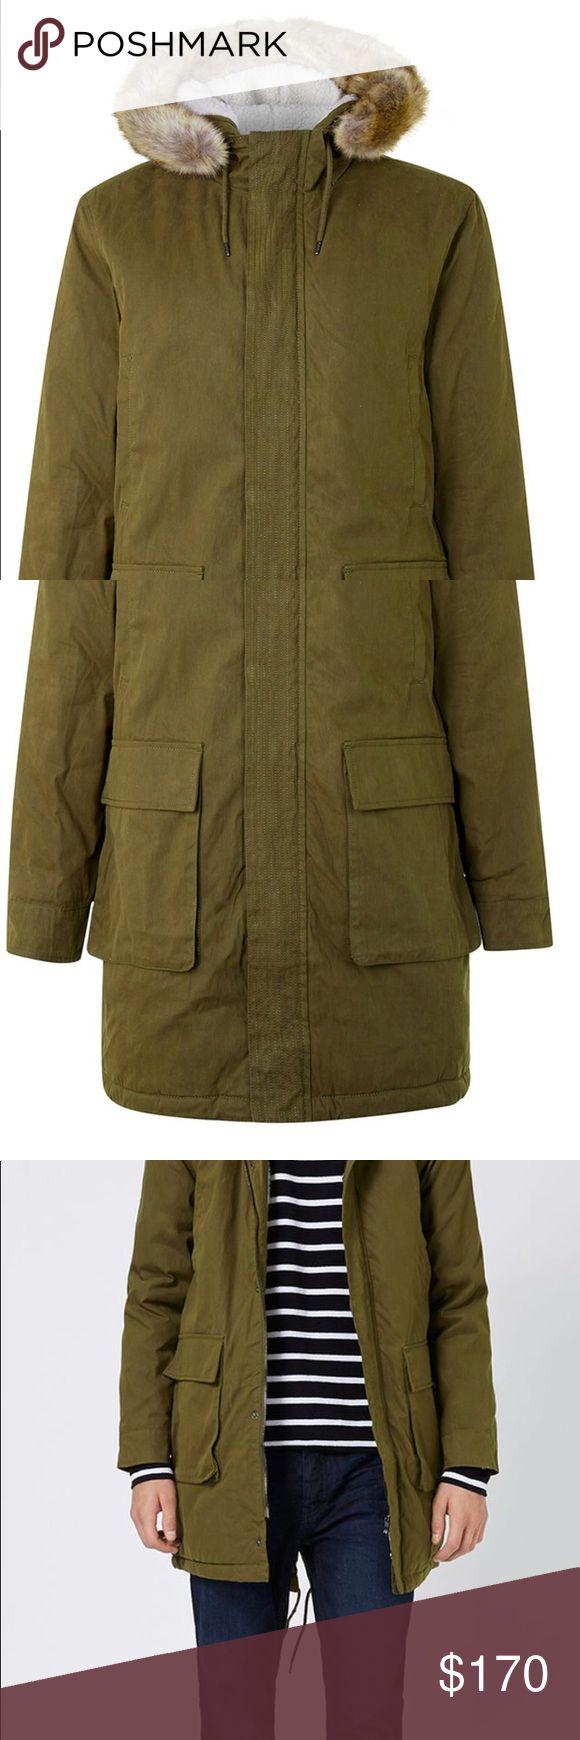 Khaki Faux Fur Hood Long Parka Brand new Topman Jackets & Coats